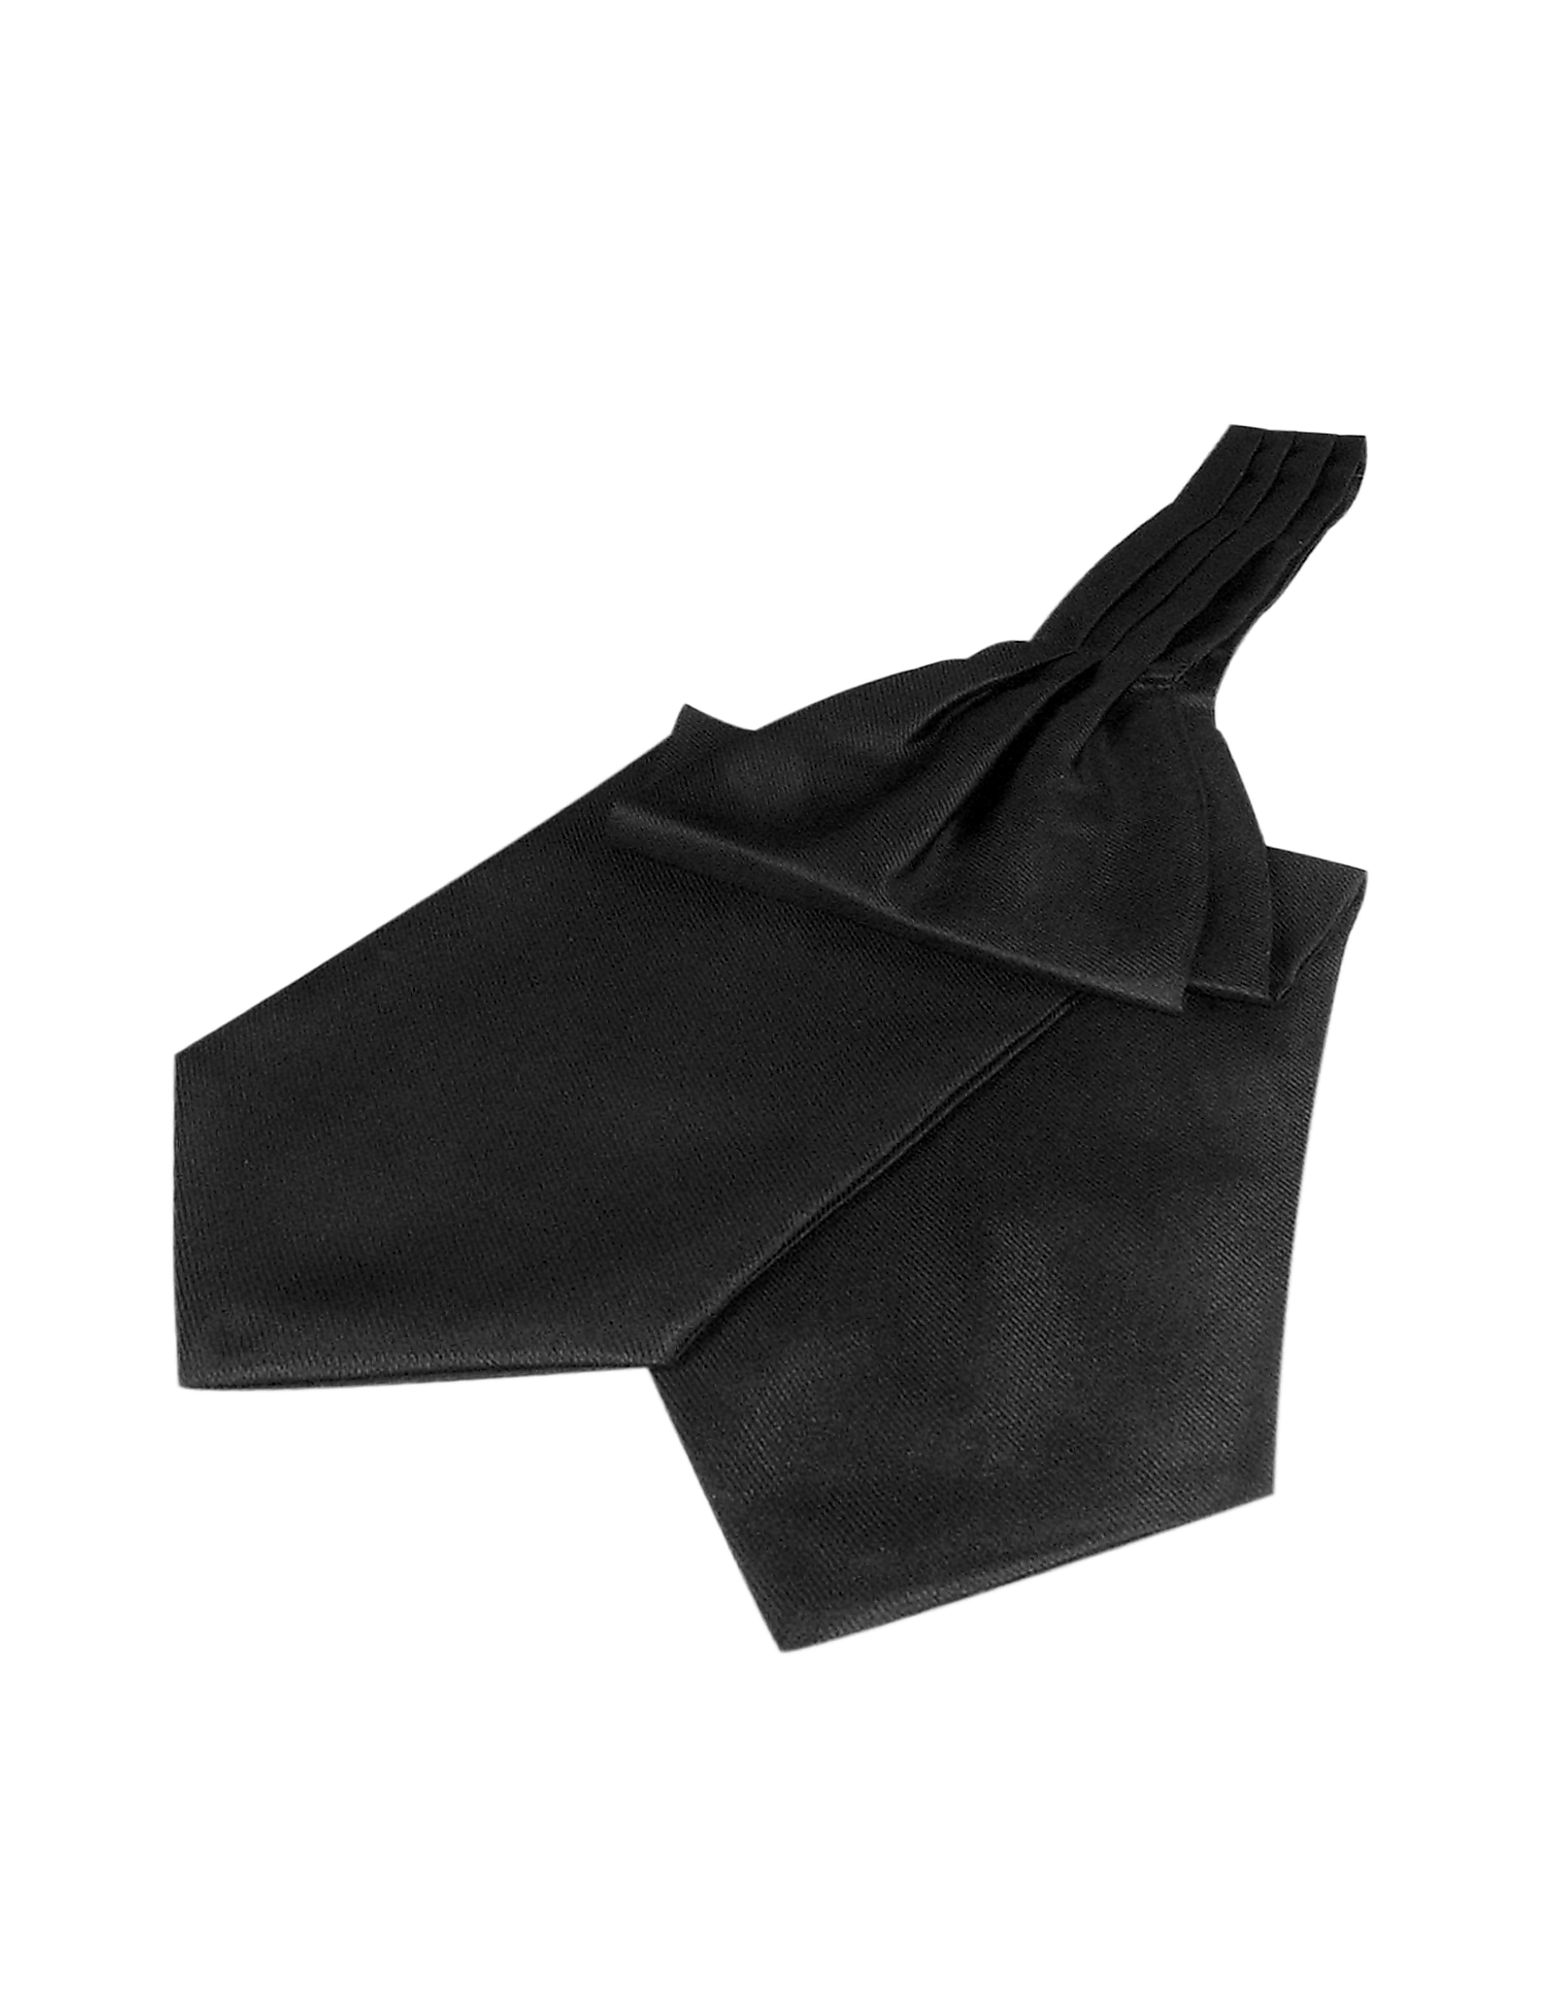 Forzieri Designer Ascot ties, Solid Color Pure Silk Ascot